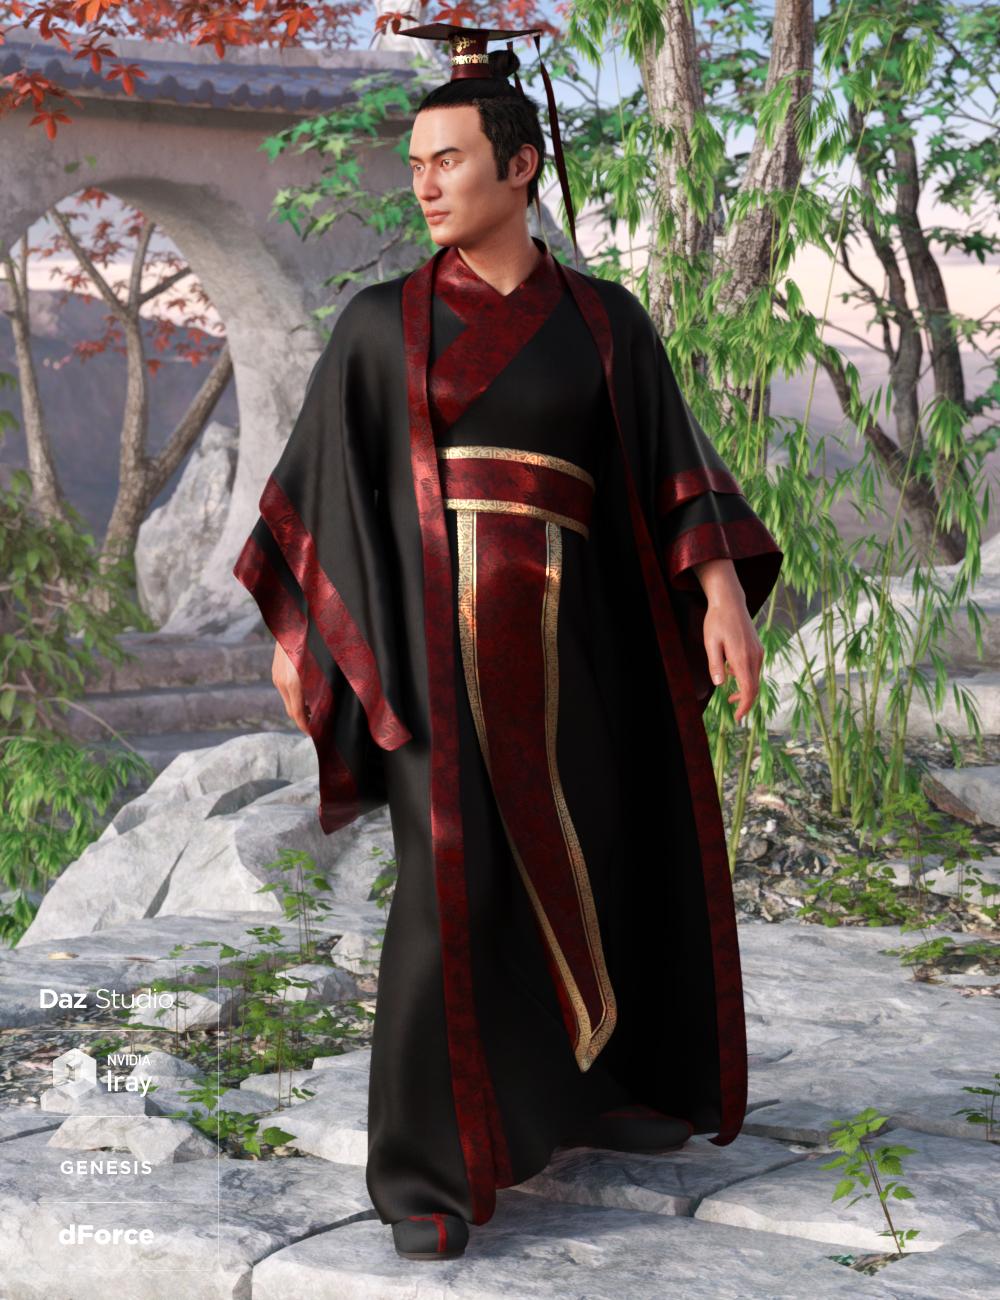 dForce Hanfu Outfit for Genesis 8 Male(s) by: Moonscape GraphicsNikisatezSade, 3D Models by Daz 3D